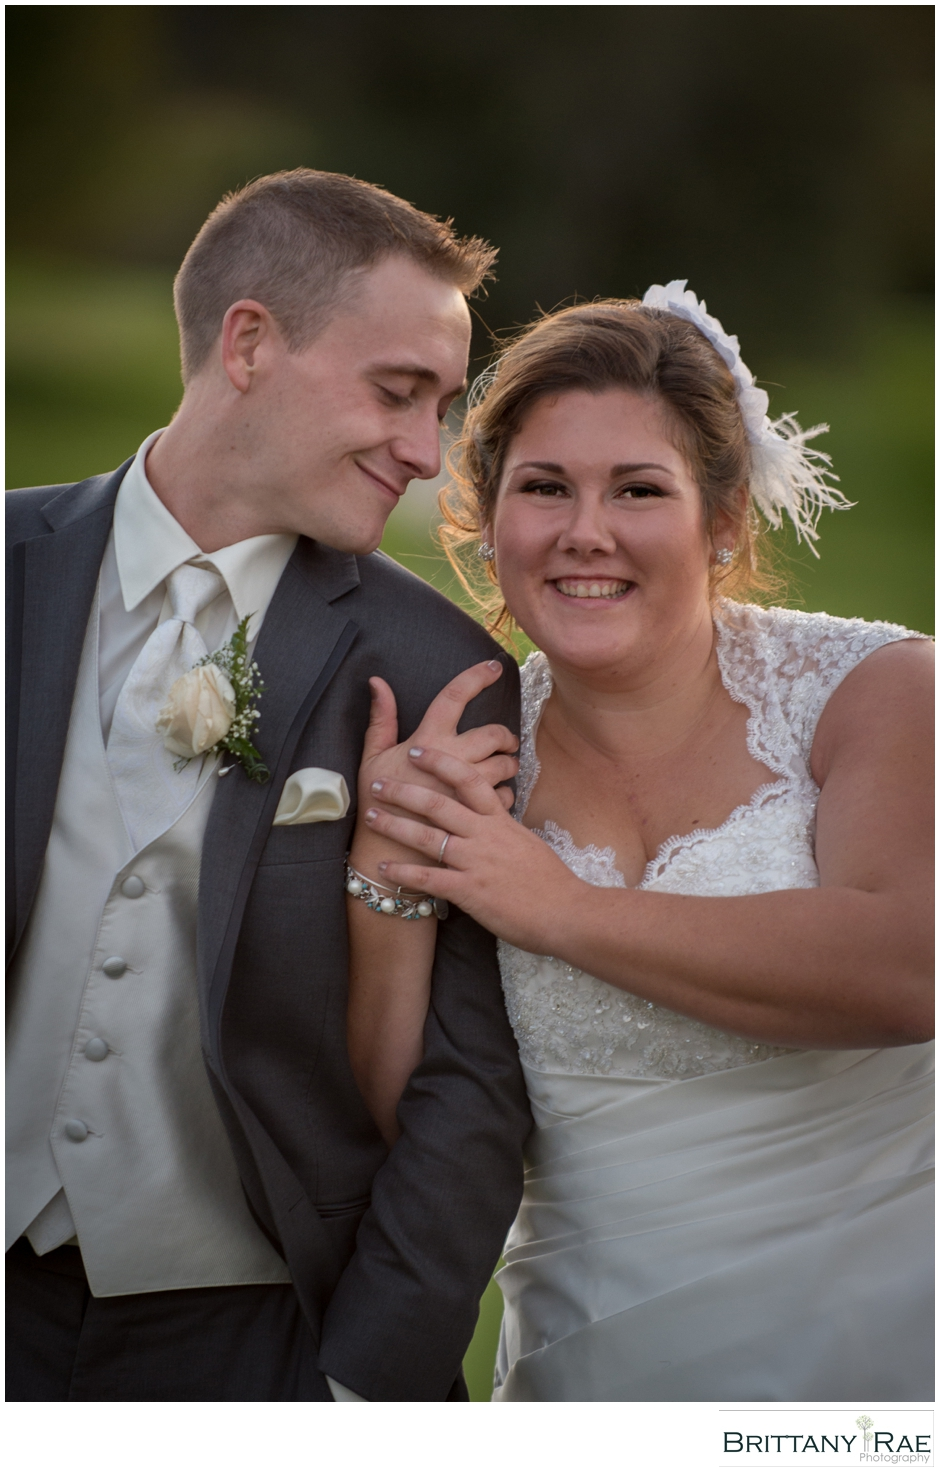 Wedding Portrait by Maine Wedding Photographer Brittany Rae Photography